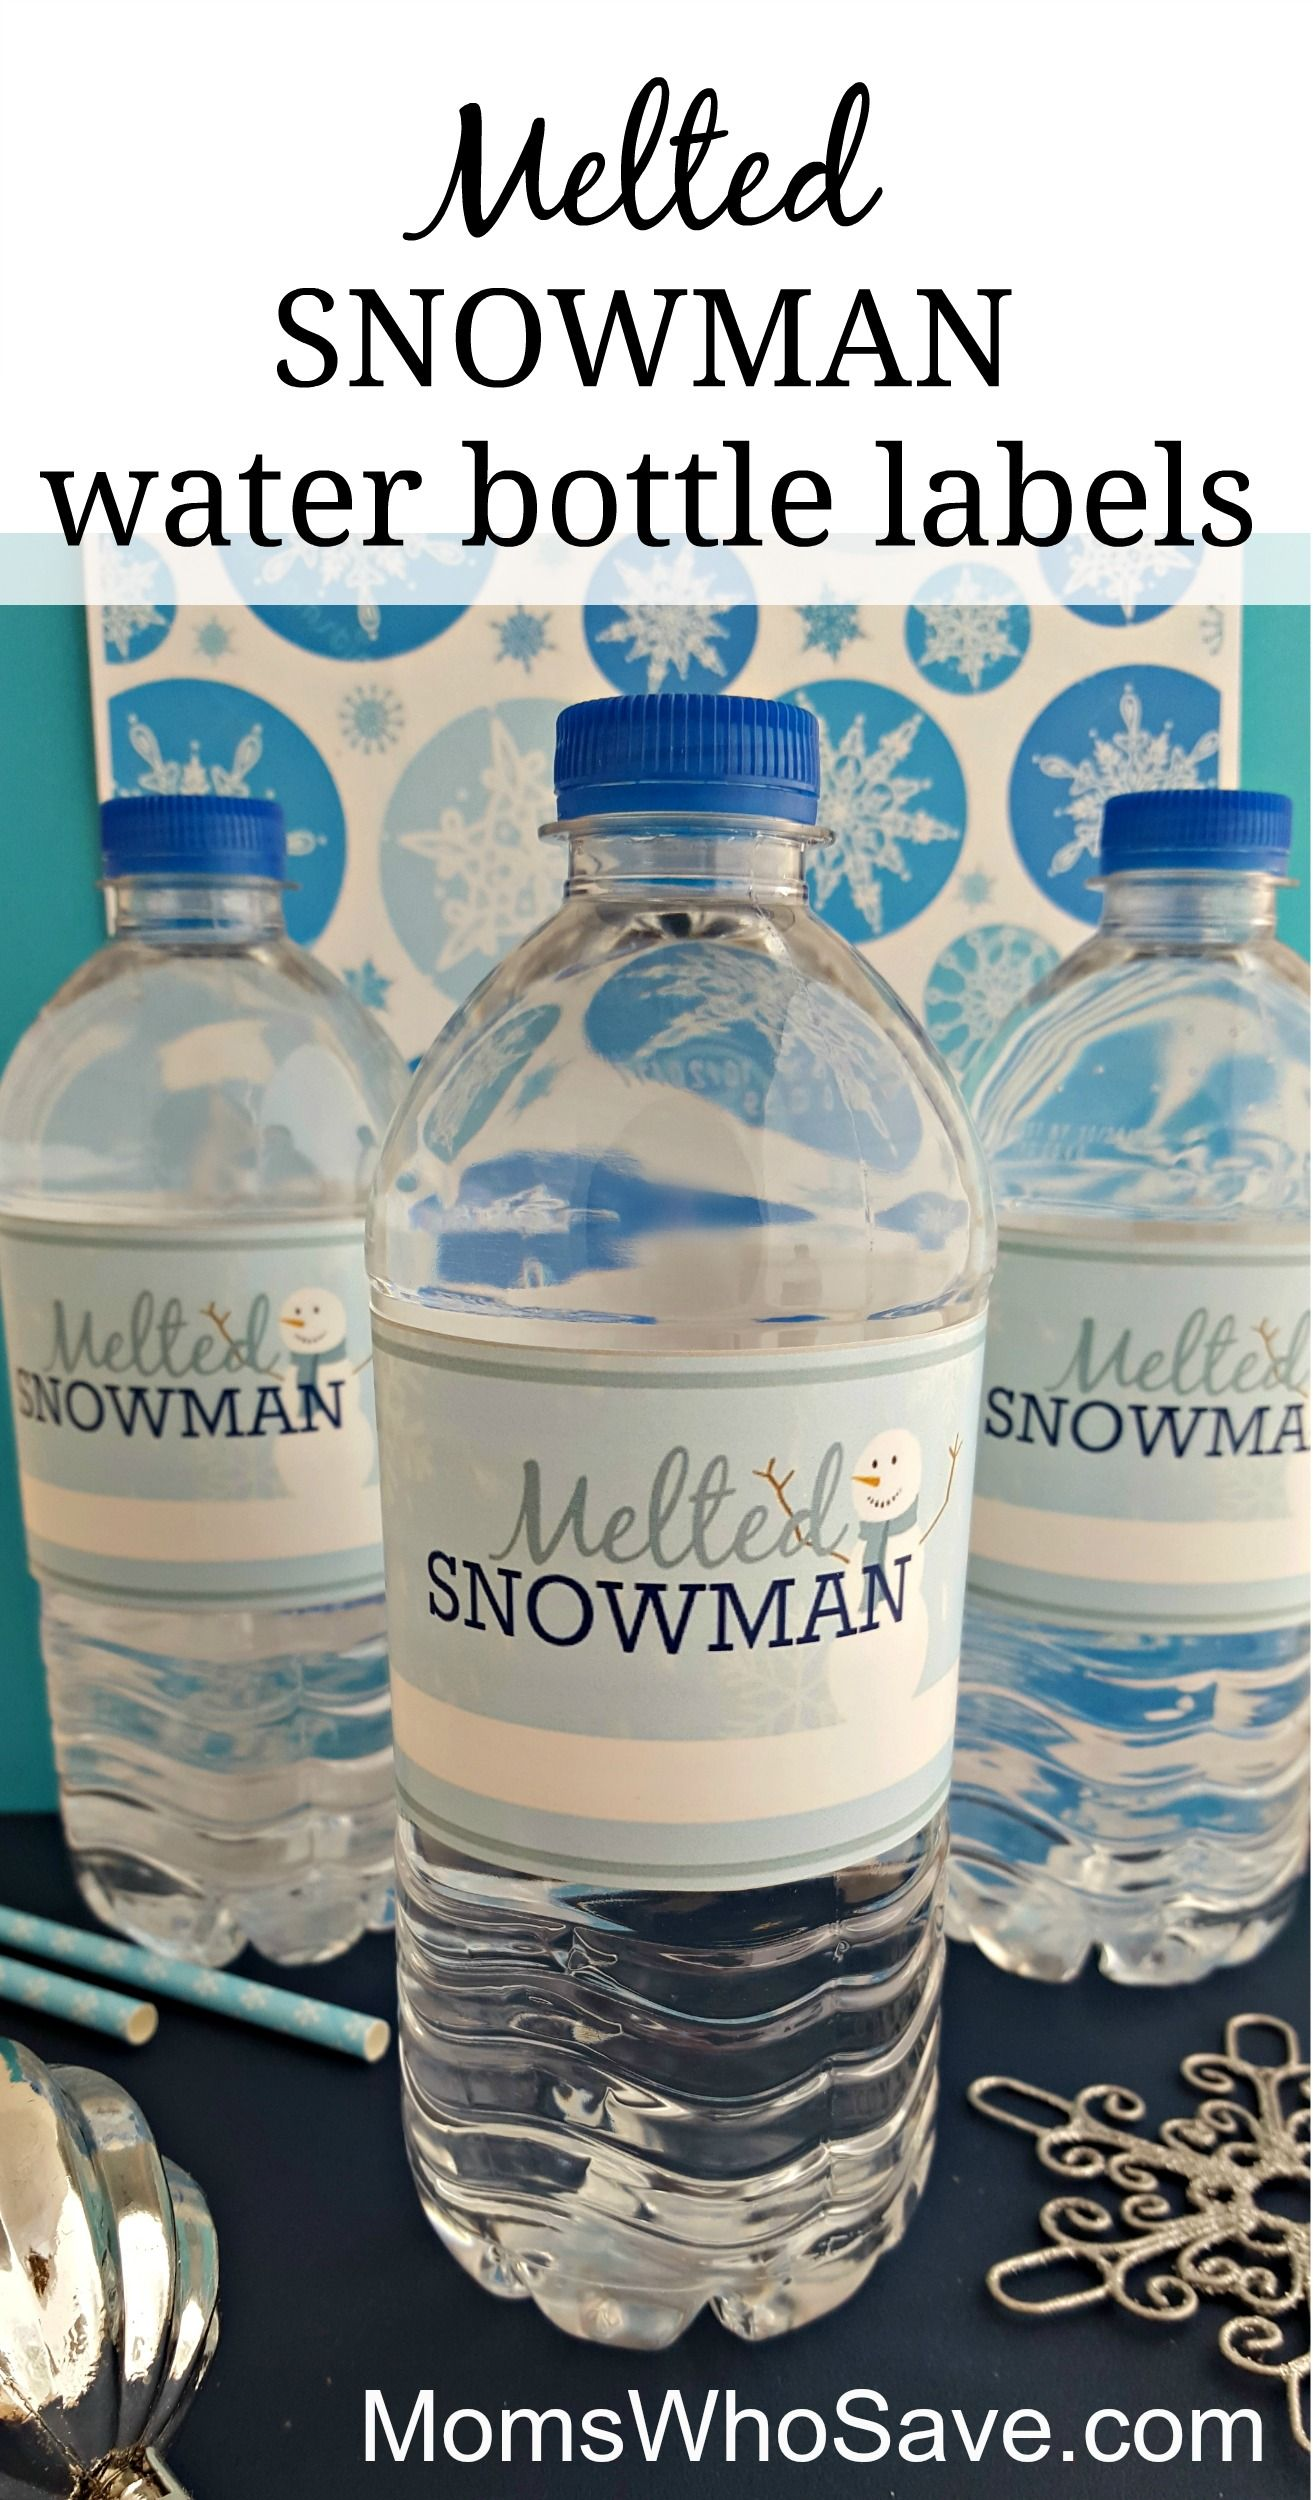 Easy Diy Free Printable Melted Snowman Water Bottle Labels Momswhosave Com Diy Water Bottle Diy Water Bottle Labels Water Bottle Labels Template Diy water bottle label template